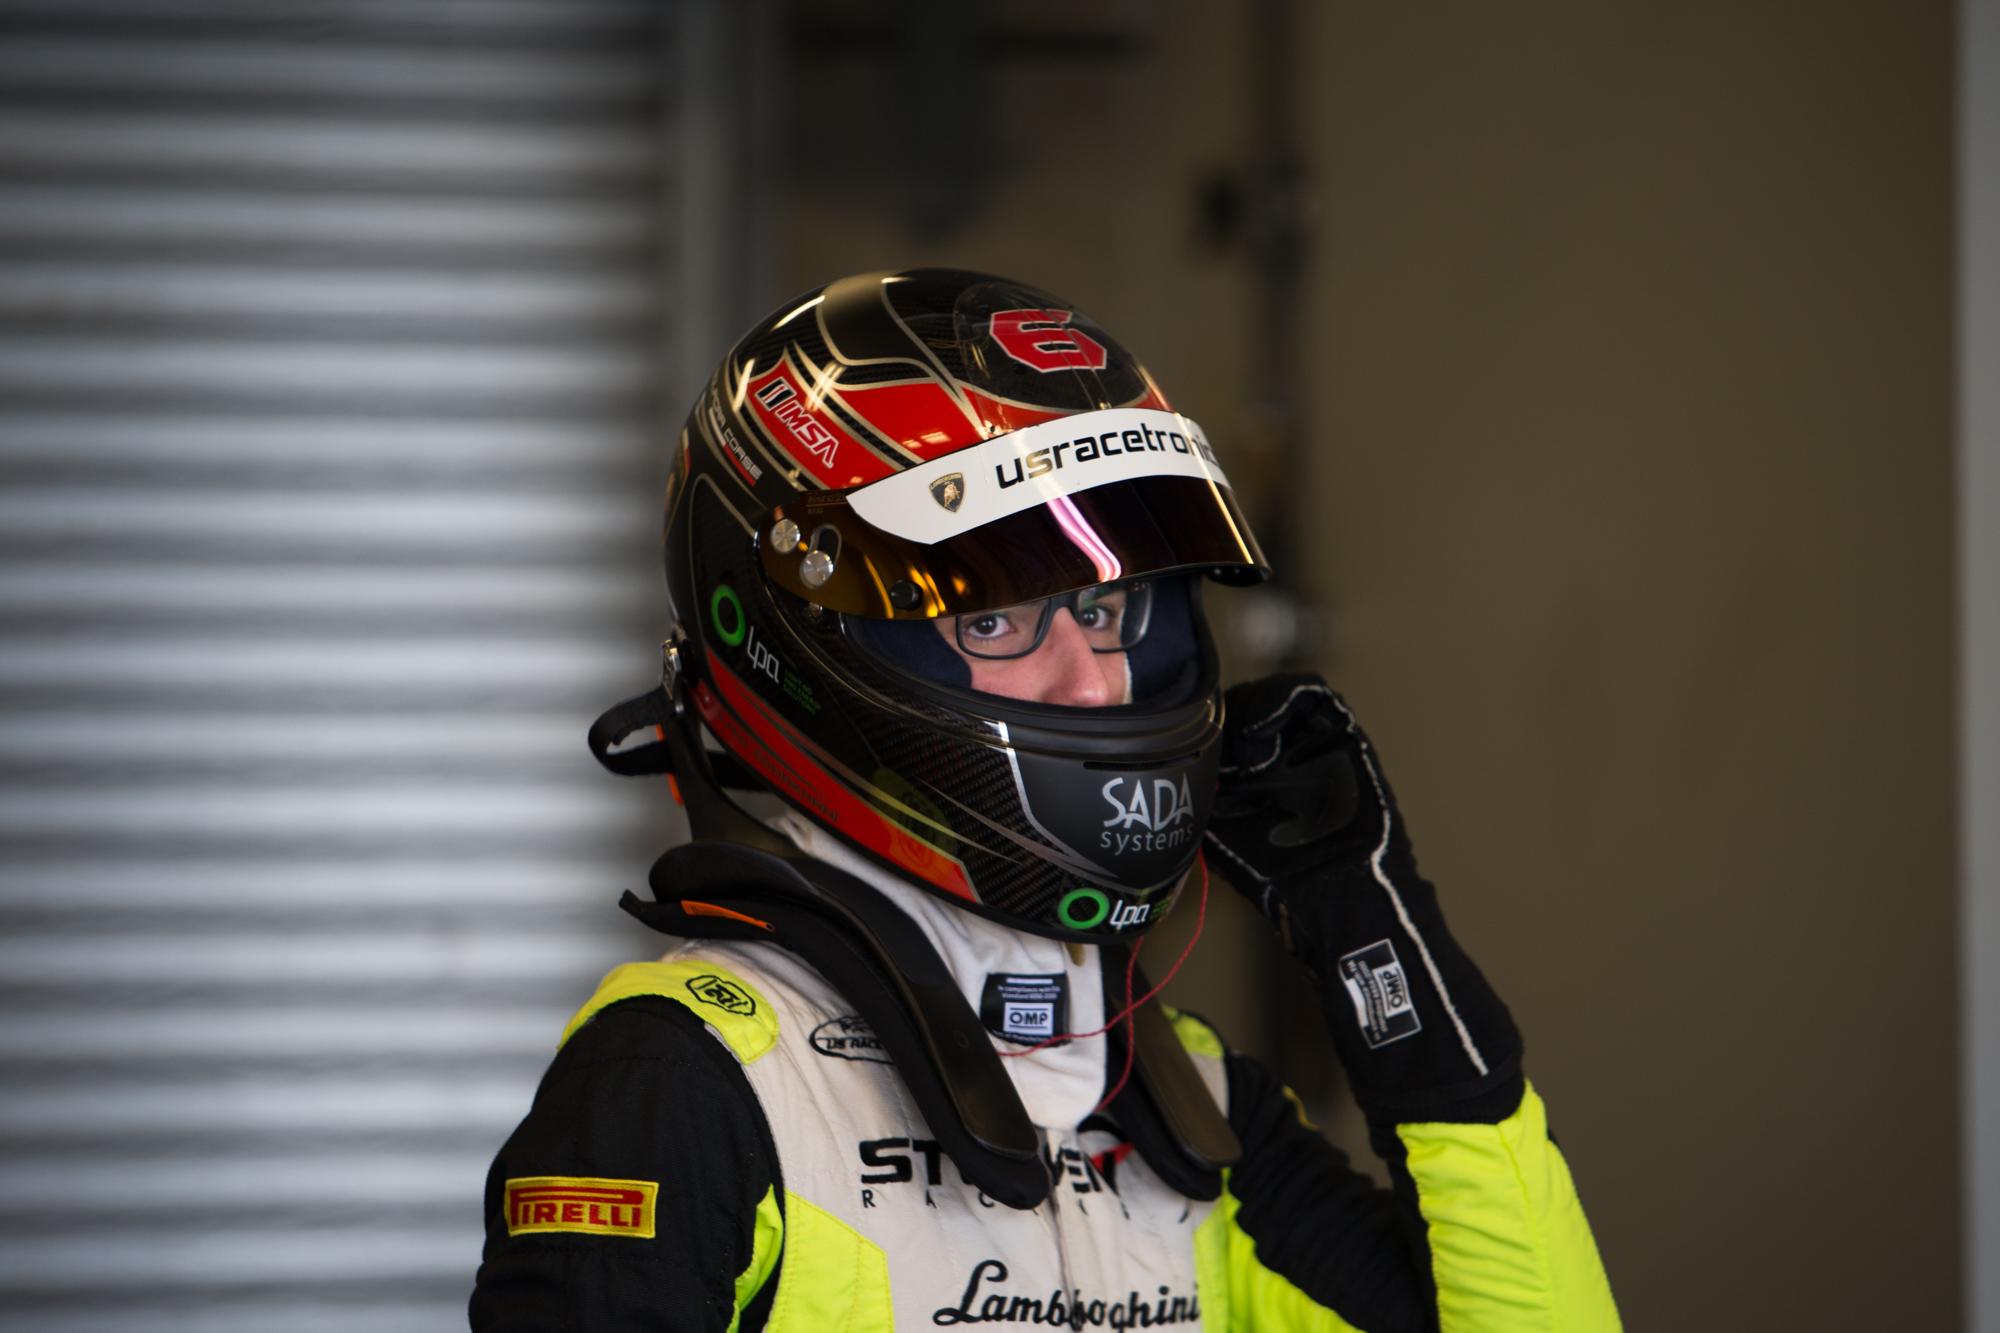 Steven-Racing-Laguna-20180531-96174.jpg